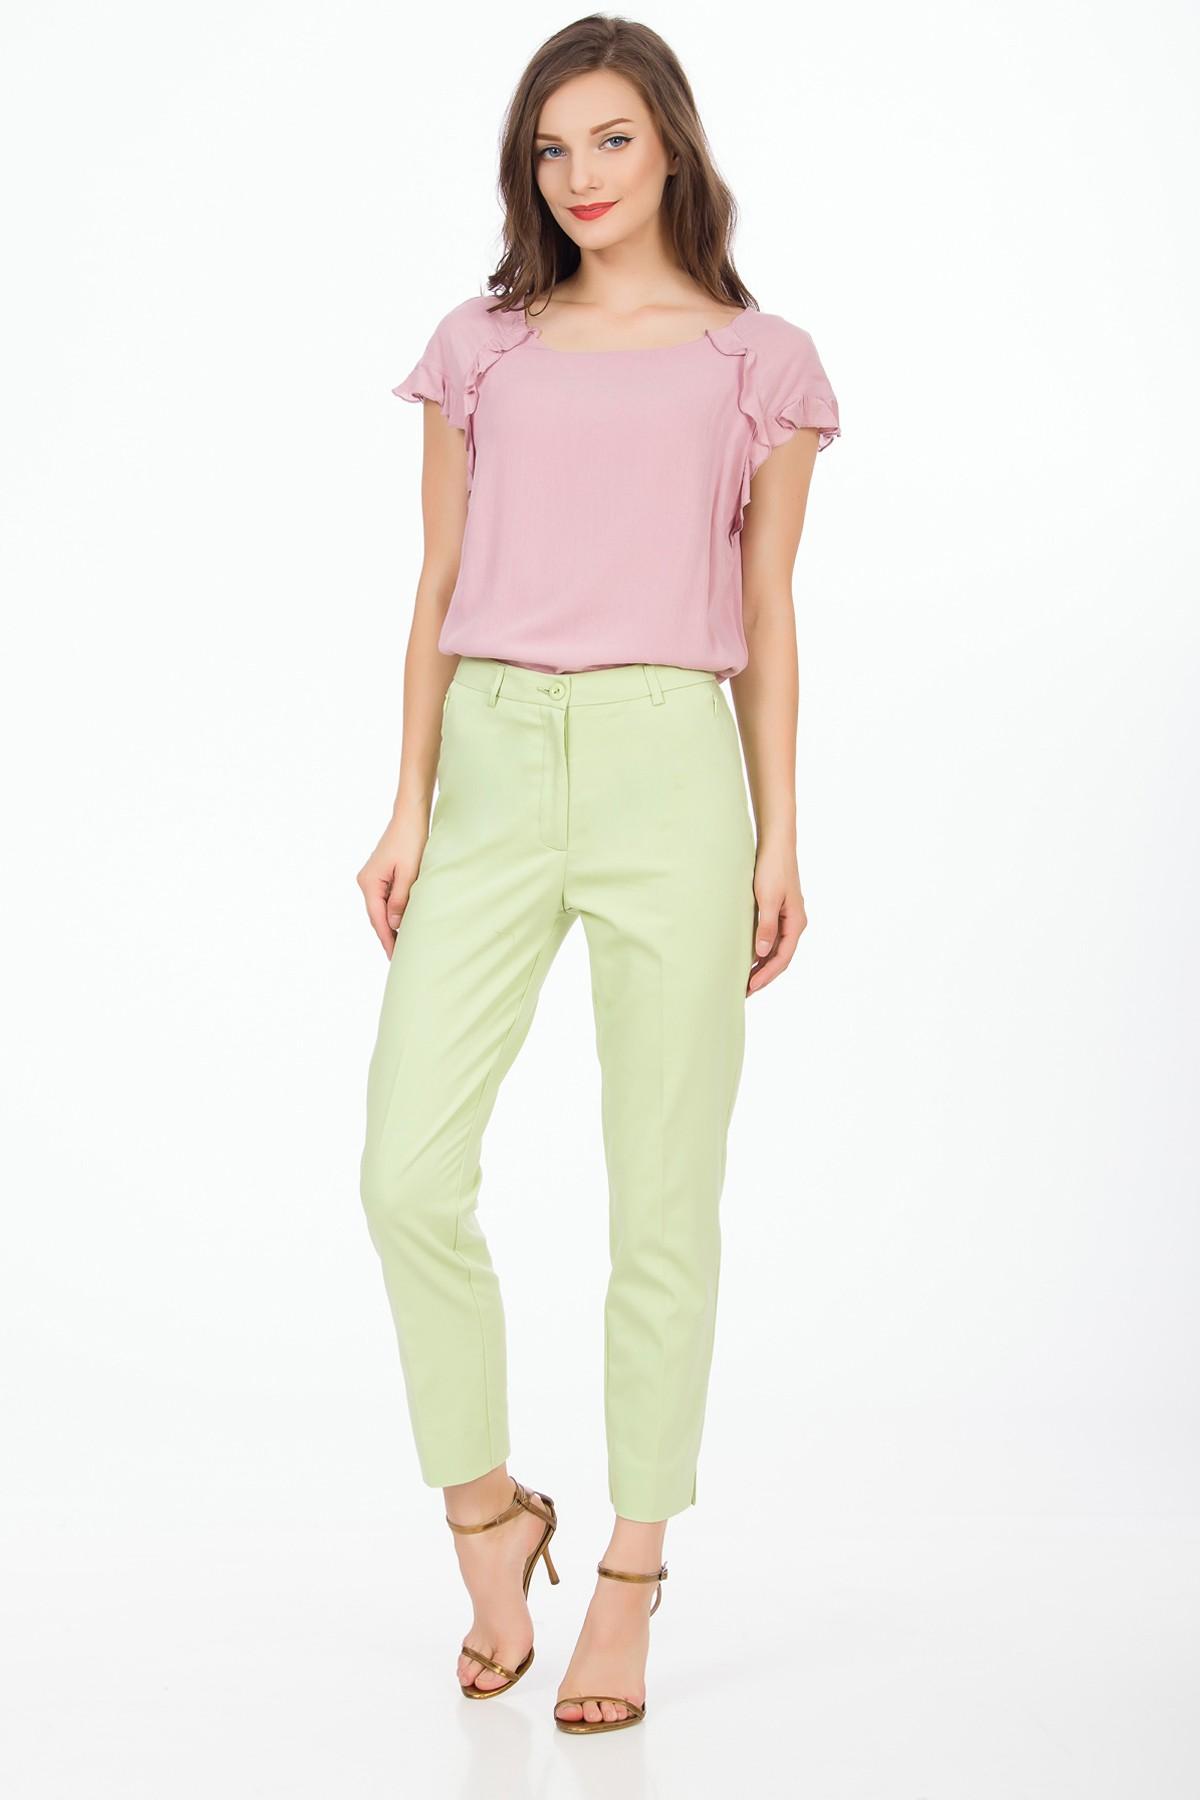 pantaloni-verde-pastel